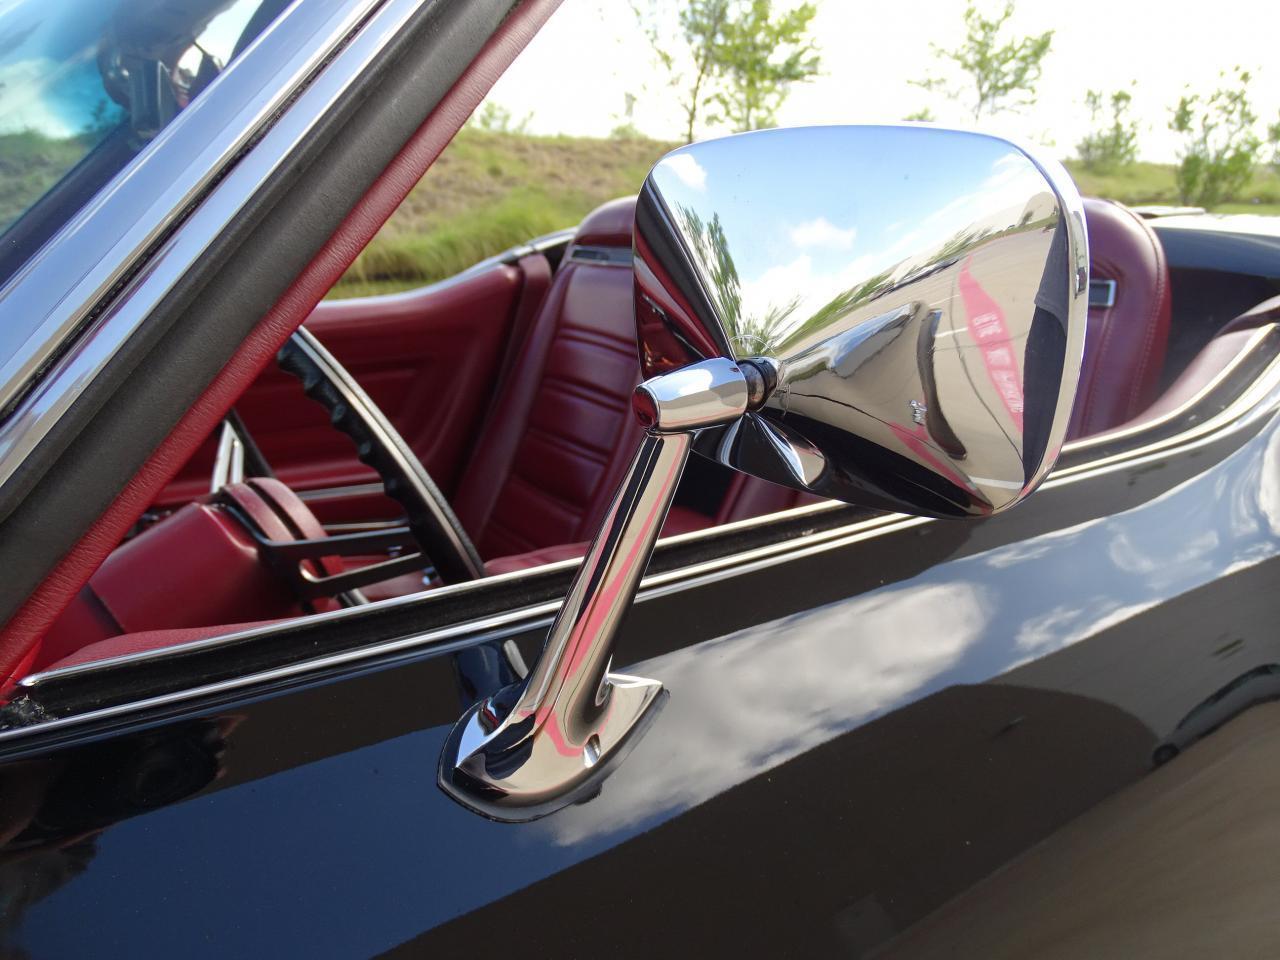 Large Picture of '74 Chevrolet Corvette located in Texas - $29,995.00 - LAOQ